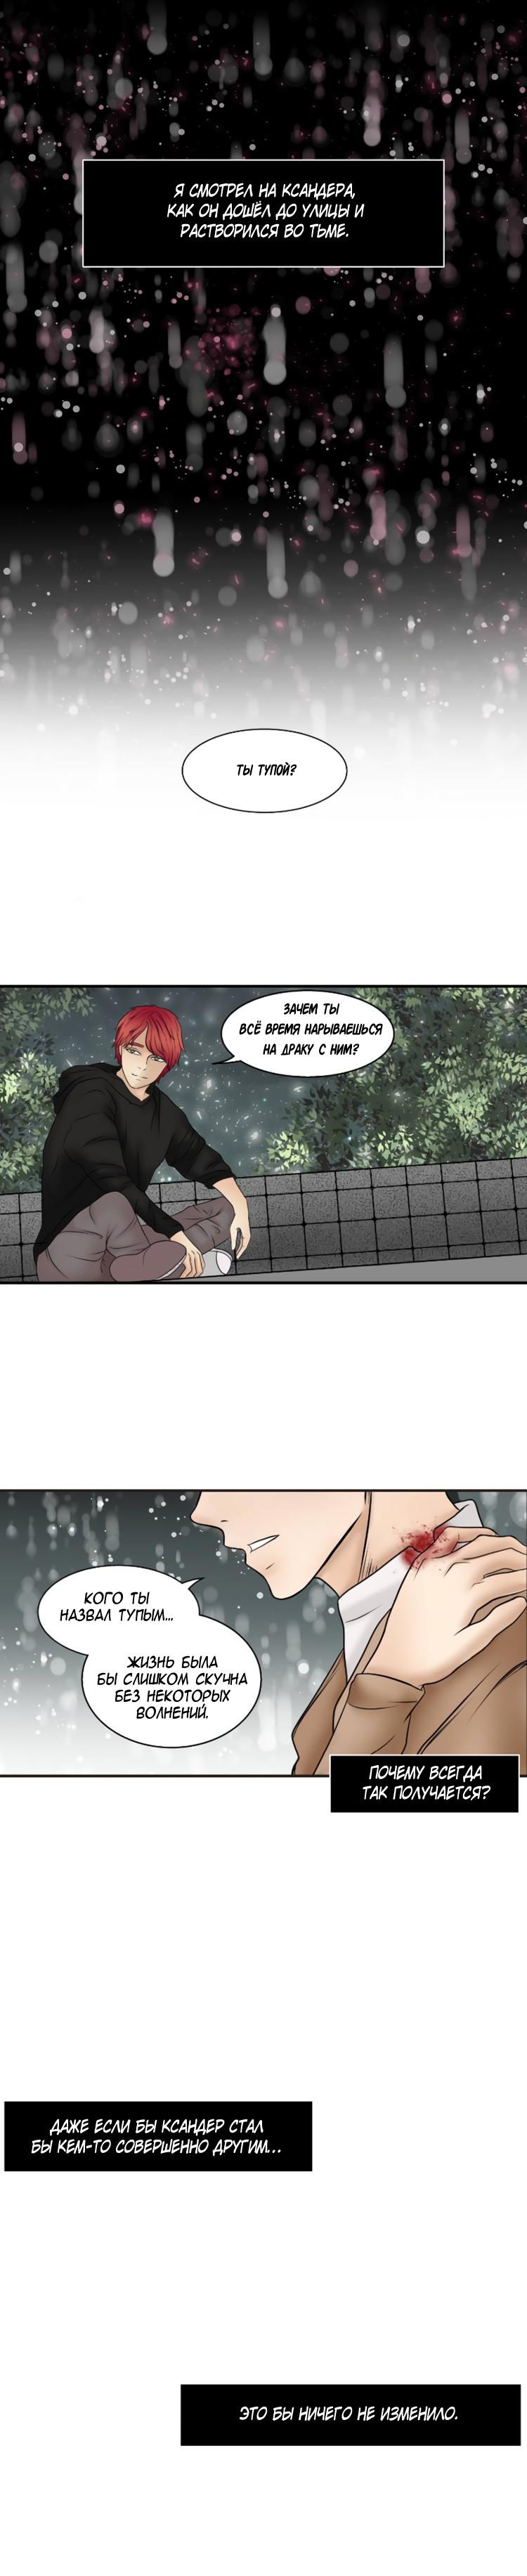 https://r2.ninemanga.com/comics/pic3/21/33557/1298592/1546974988125.jpg Page 1